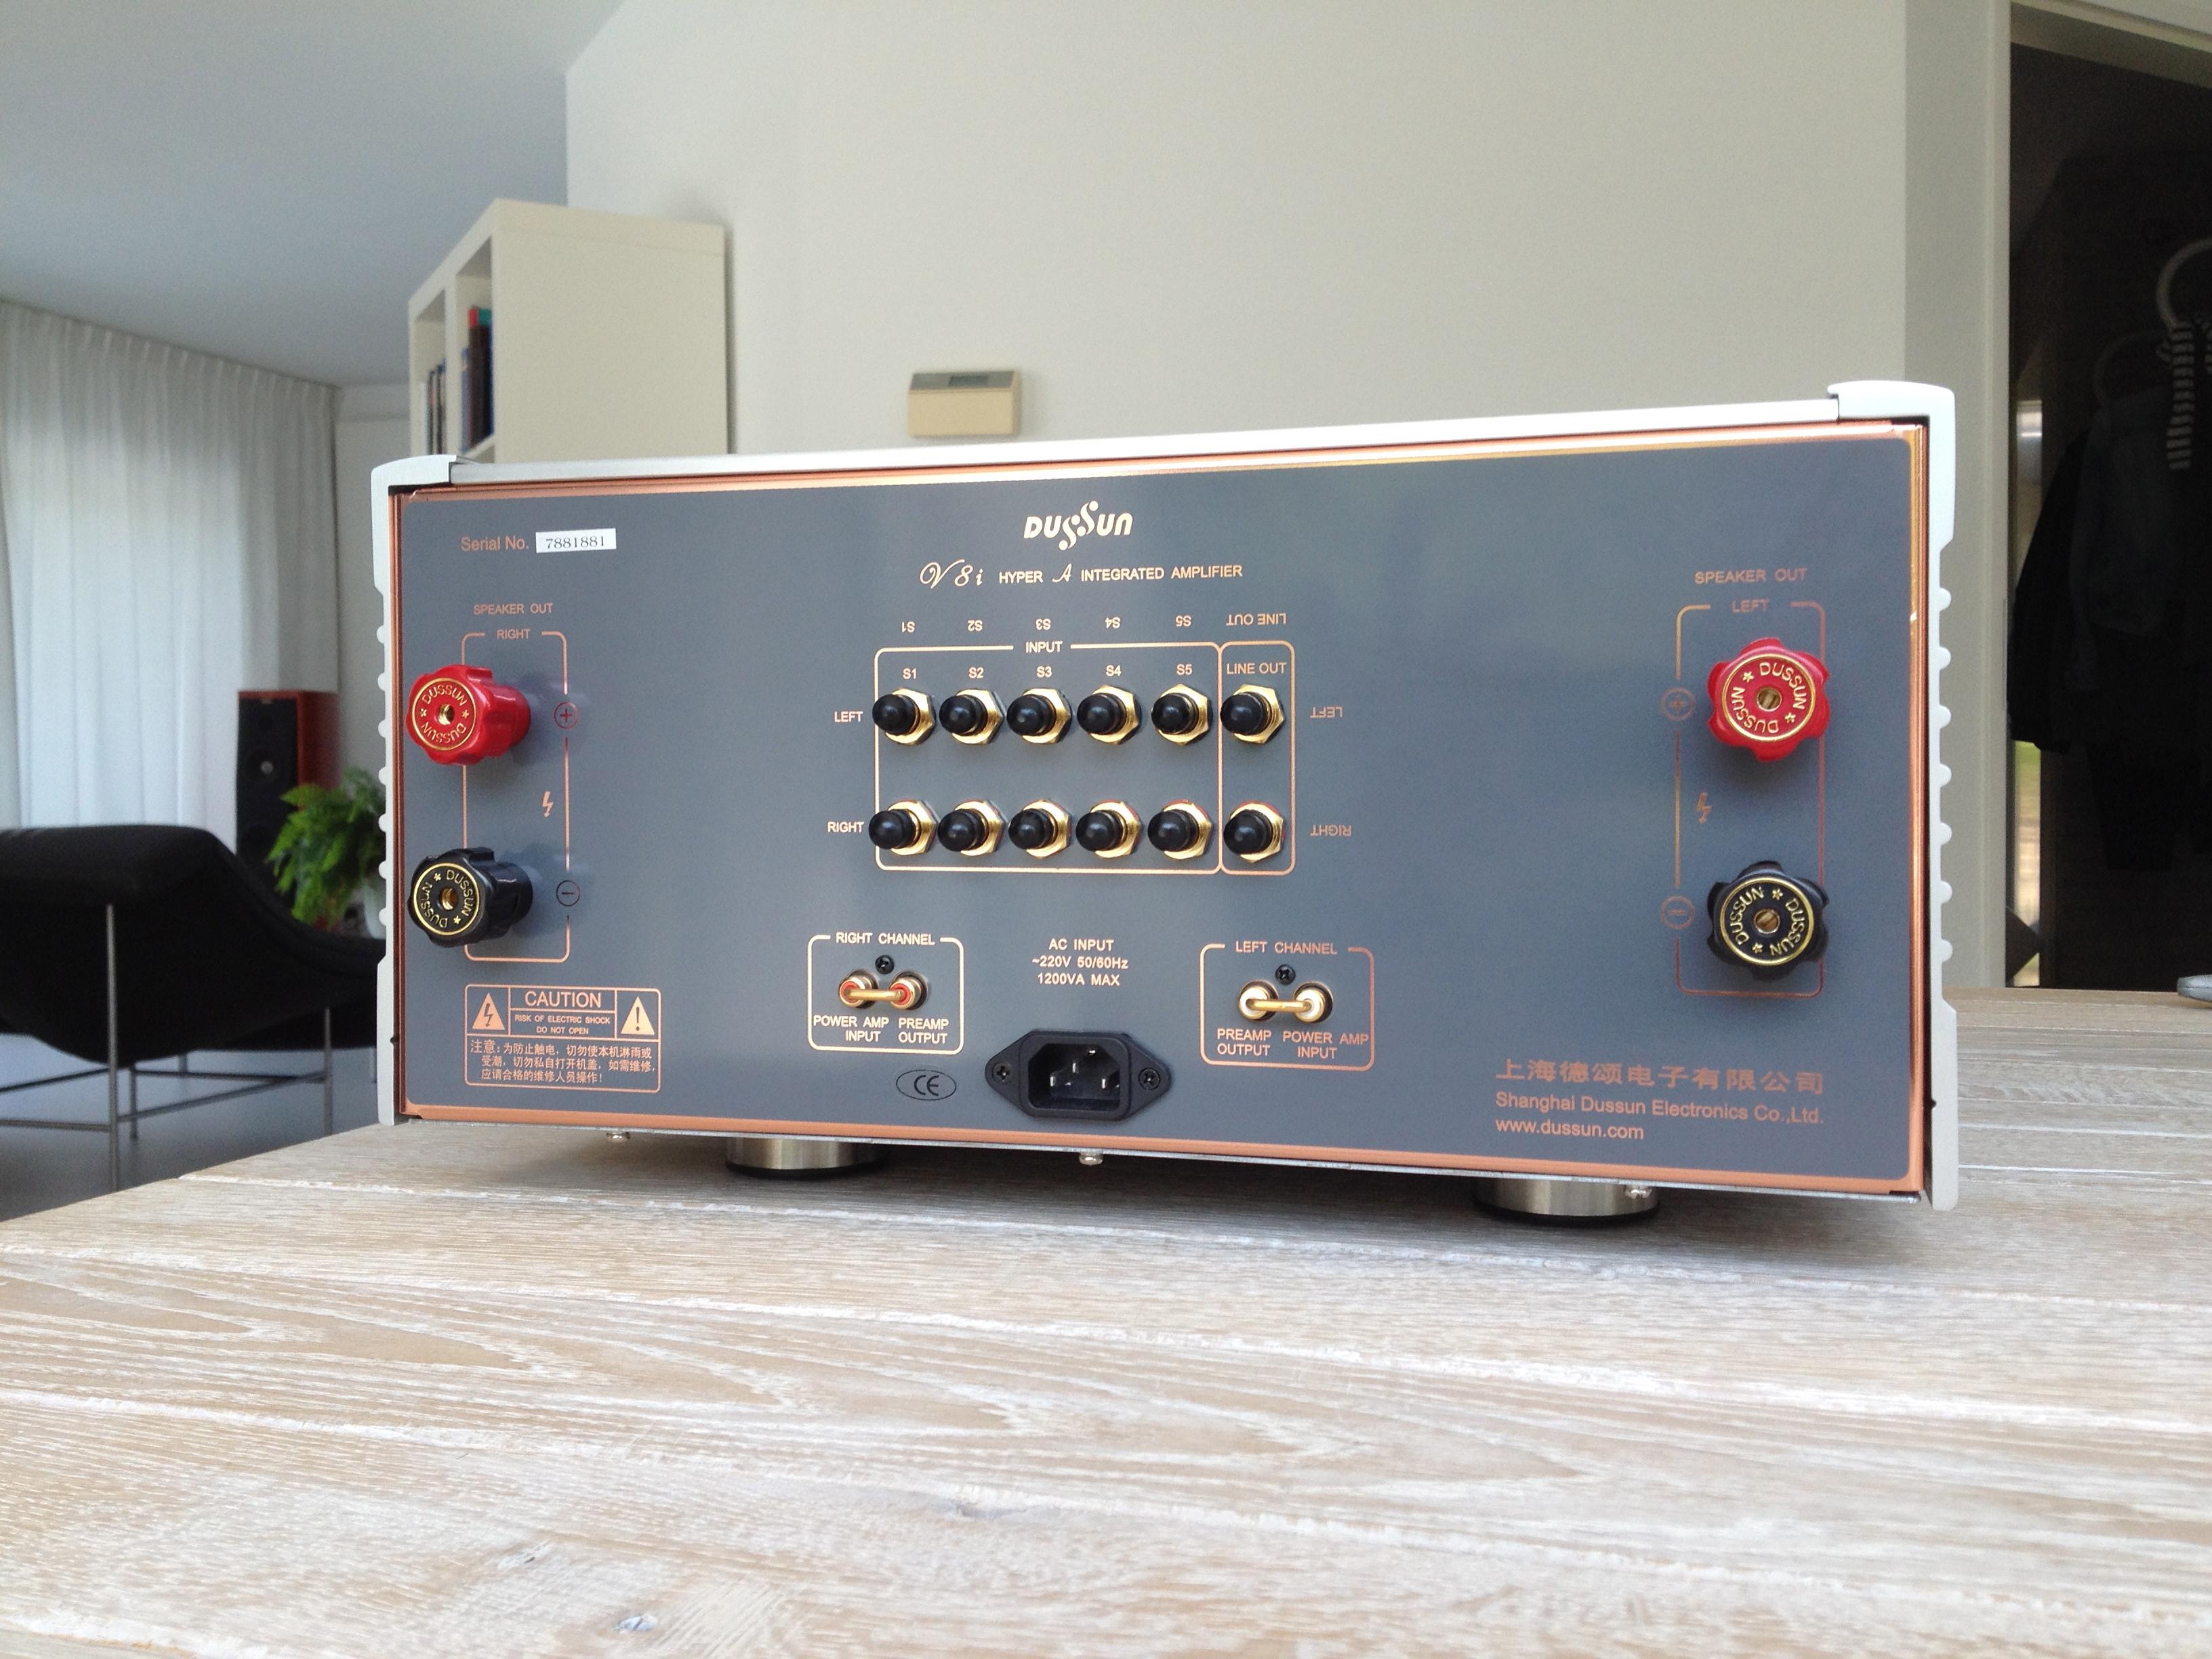 Wonderbaar Dussun V8i geïntegreerde versterker FF-94